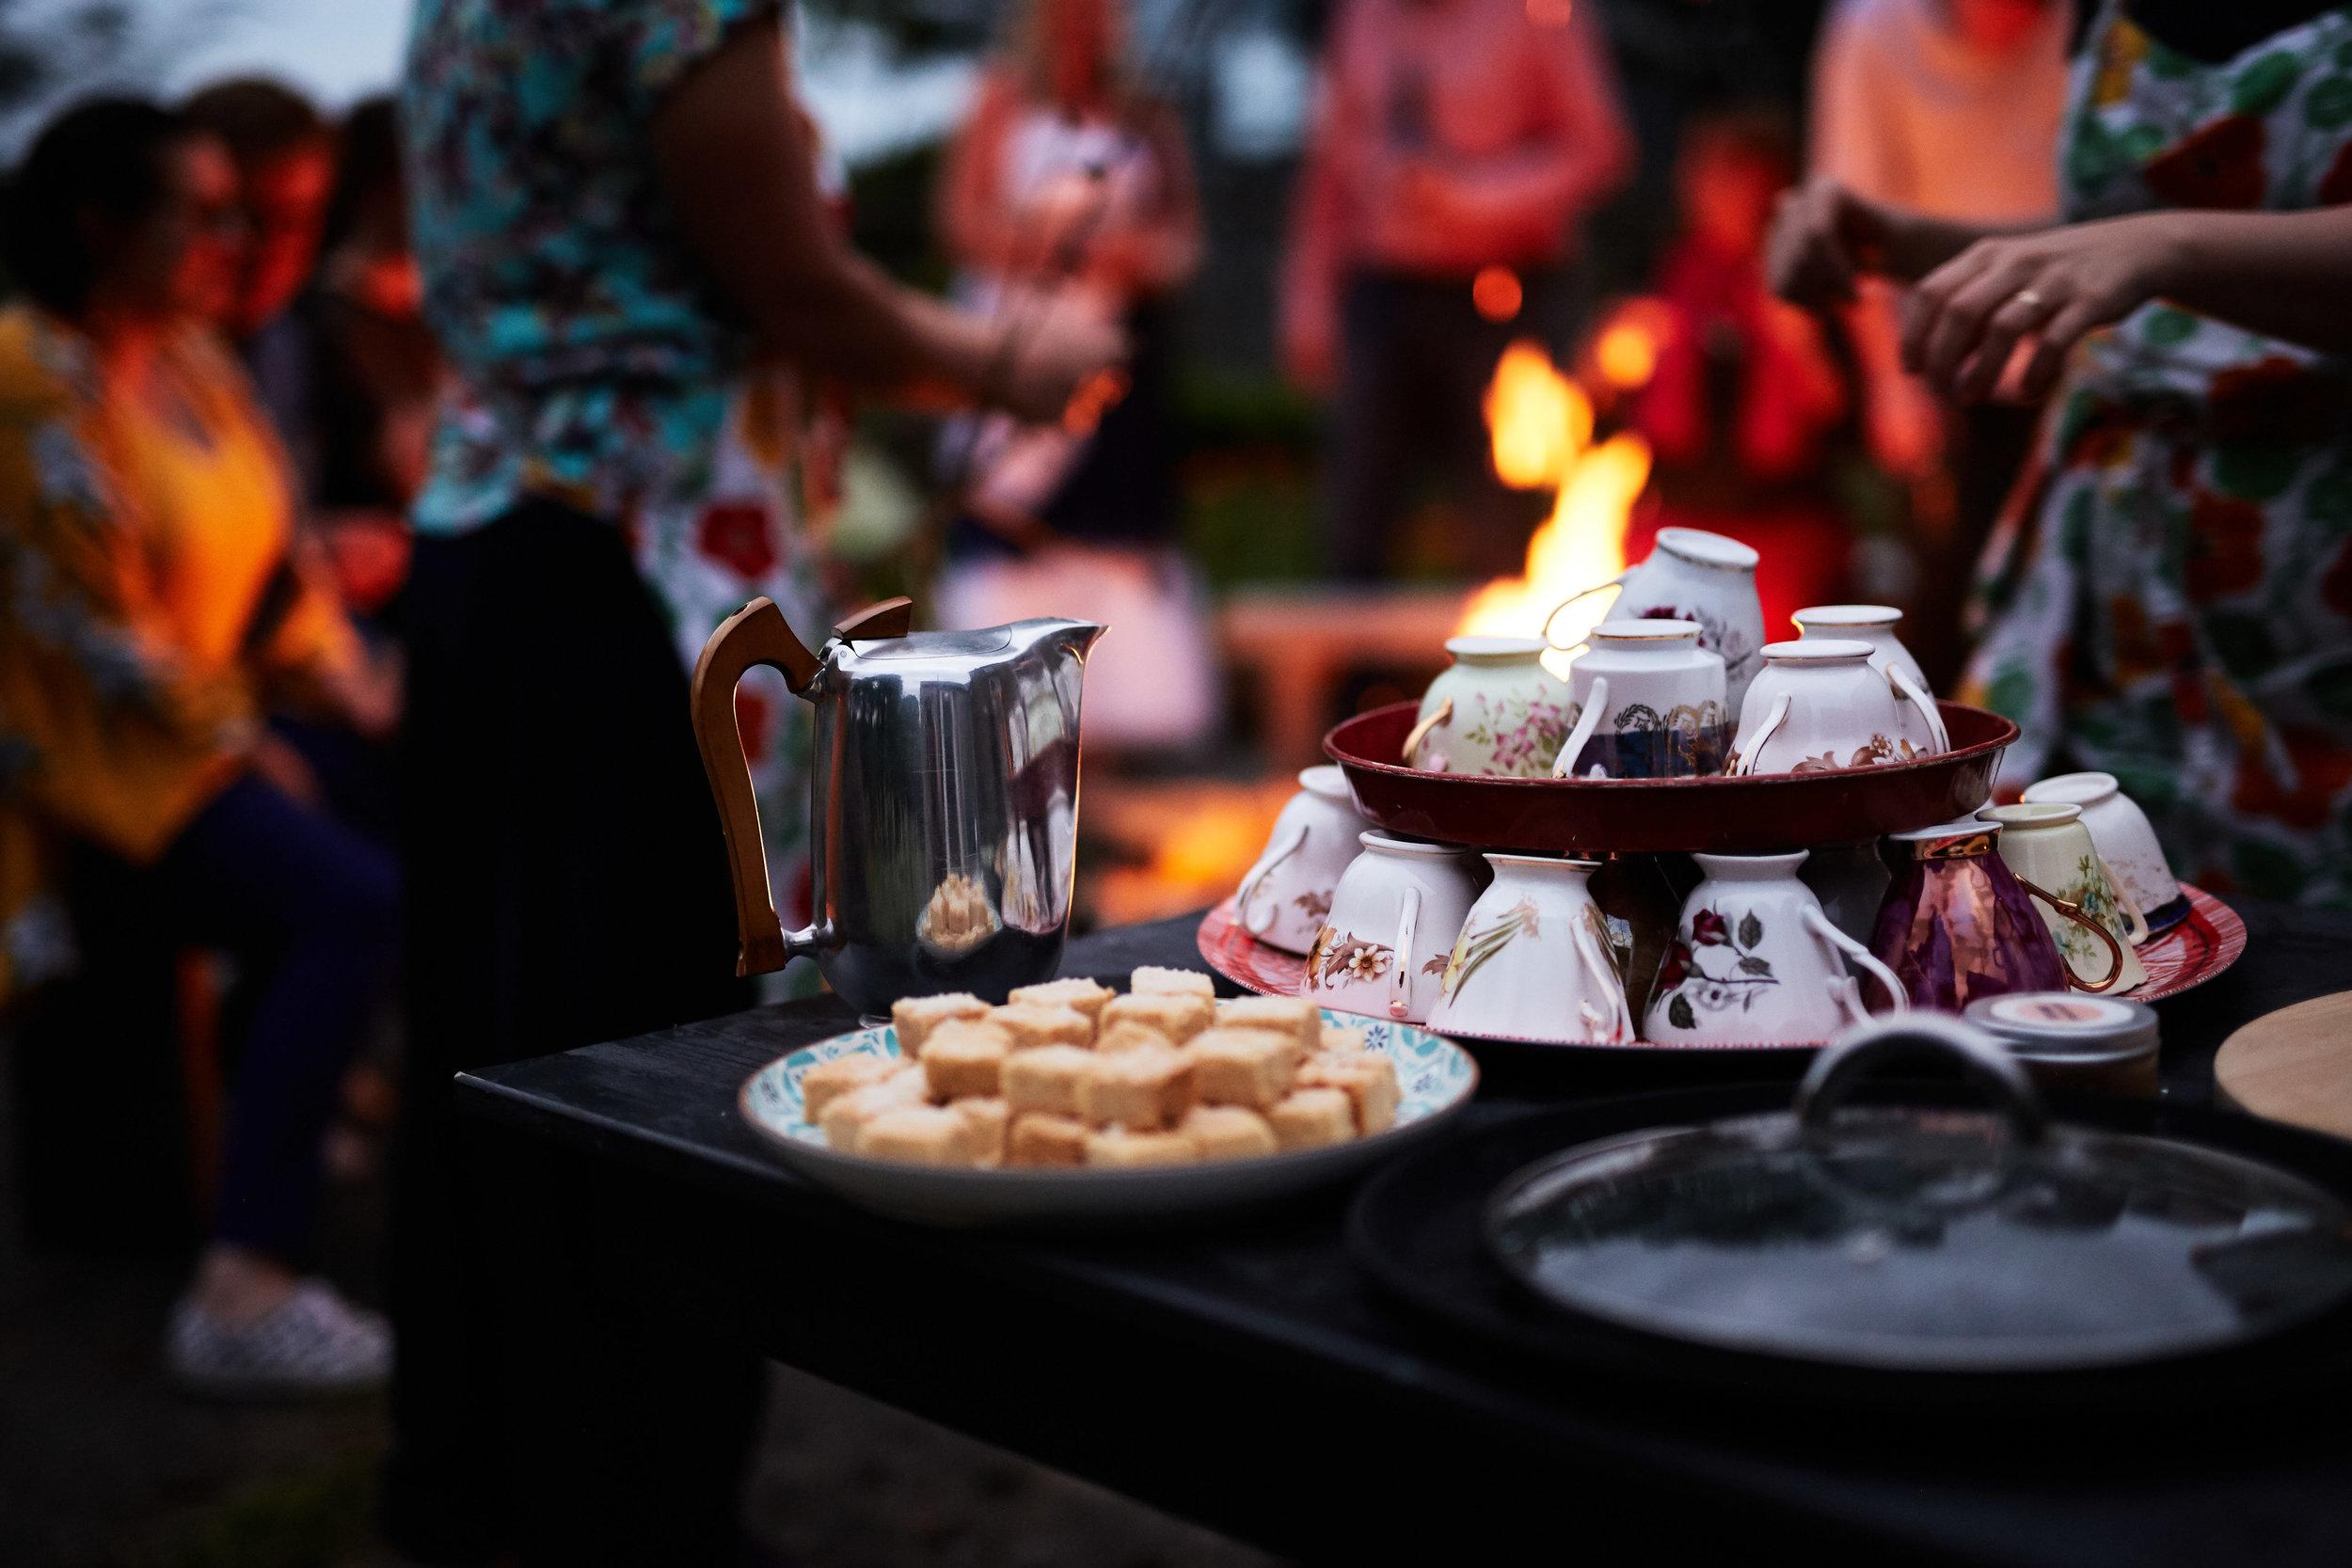 Chai tea around the fire pit